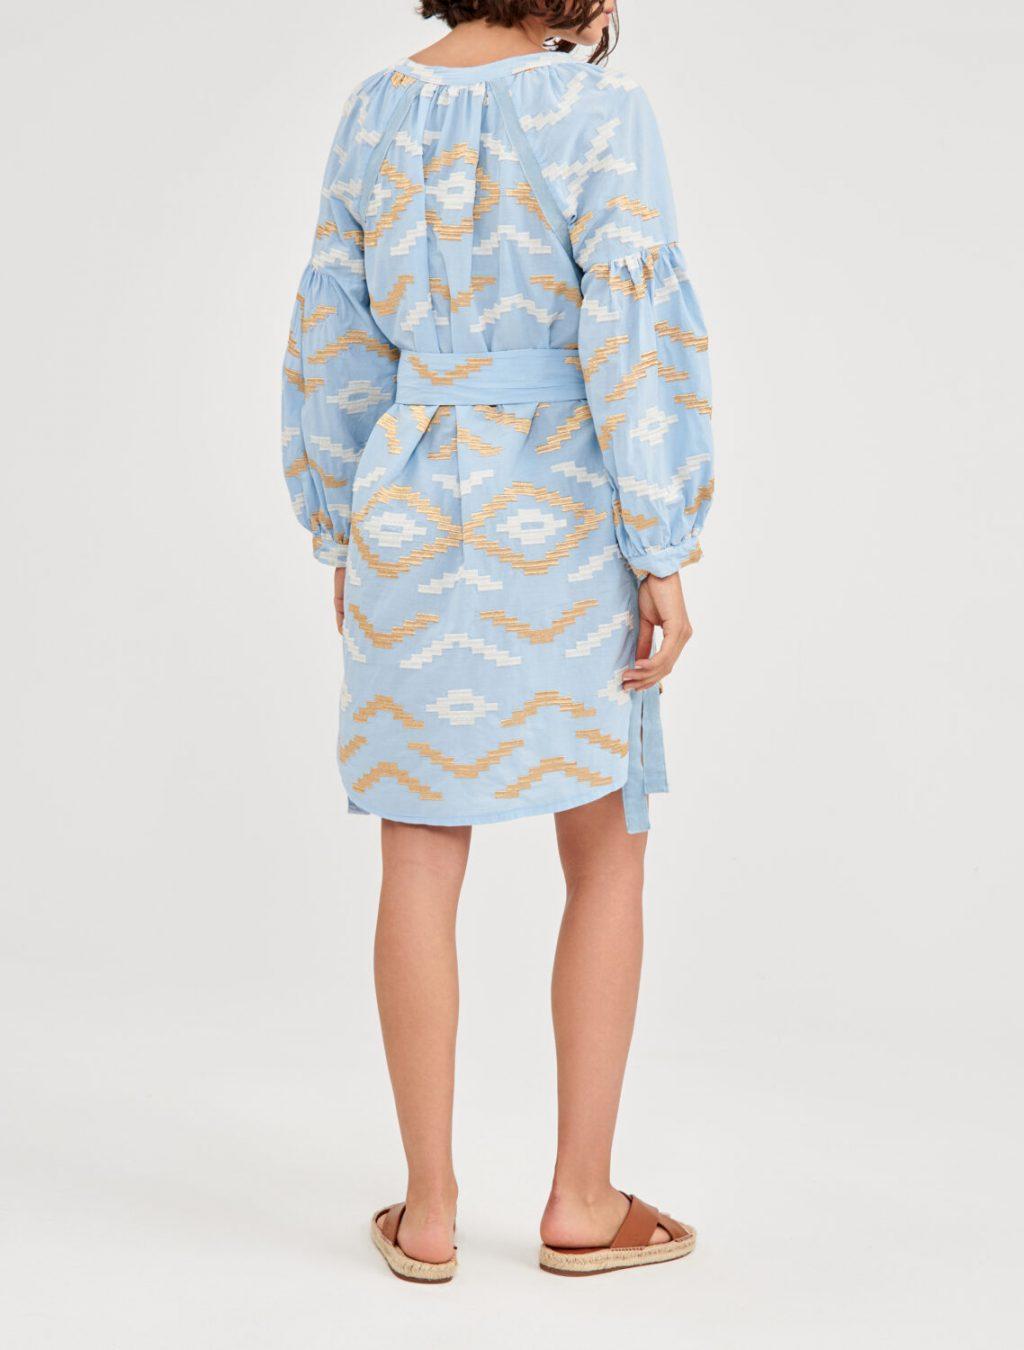 Collection Spring - Summer 2021 KORI-GREEK ARCHAIC BOHO DRESS EMBROIDERED